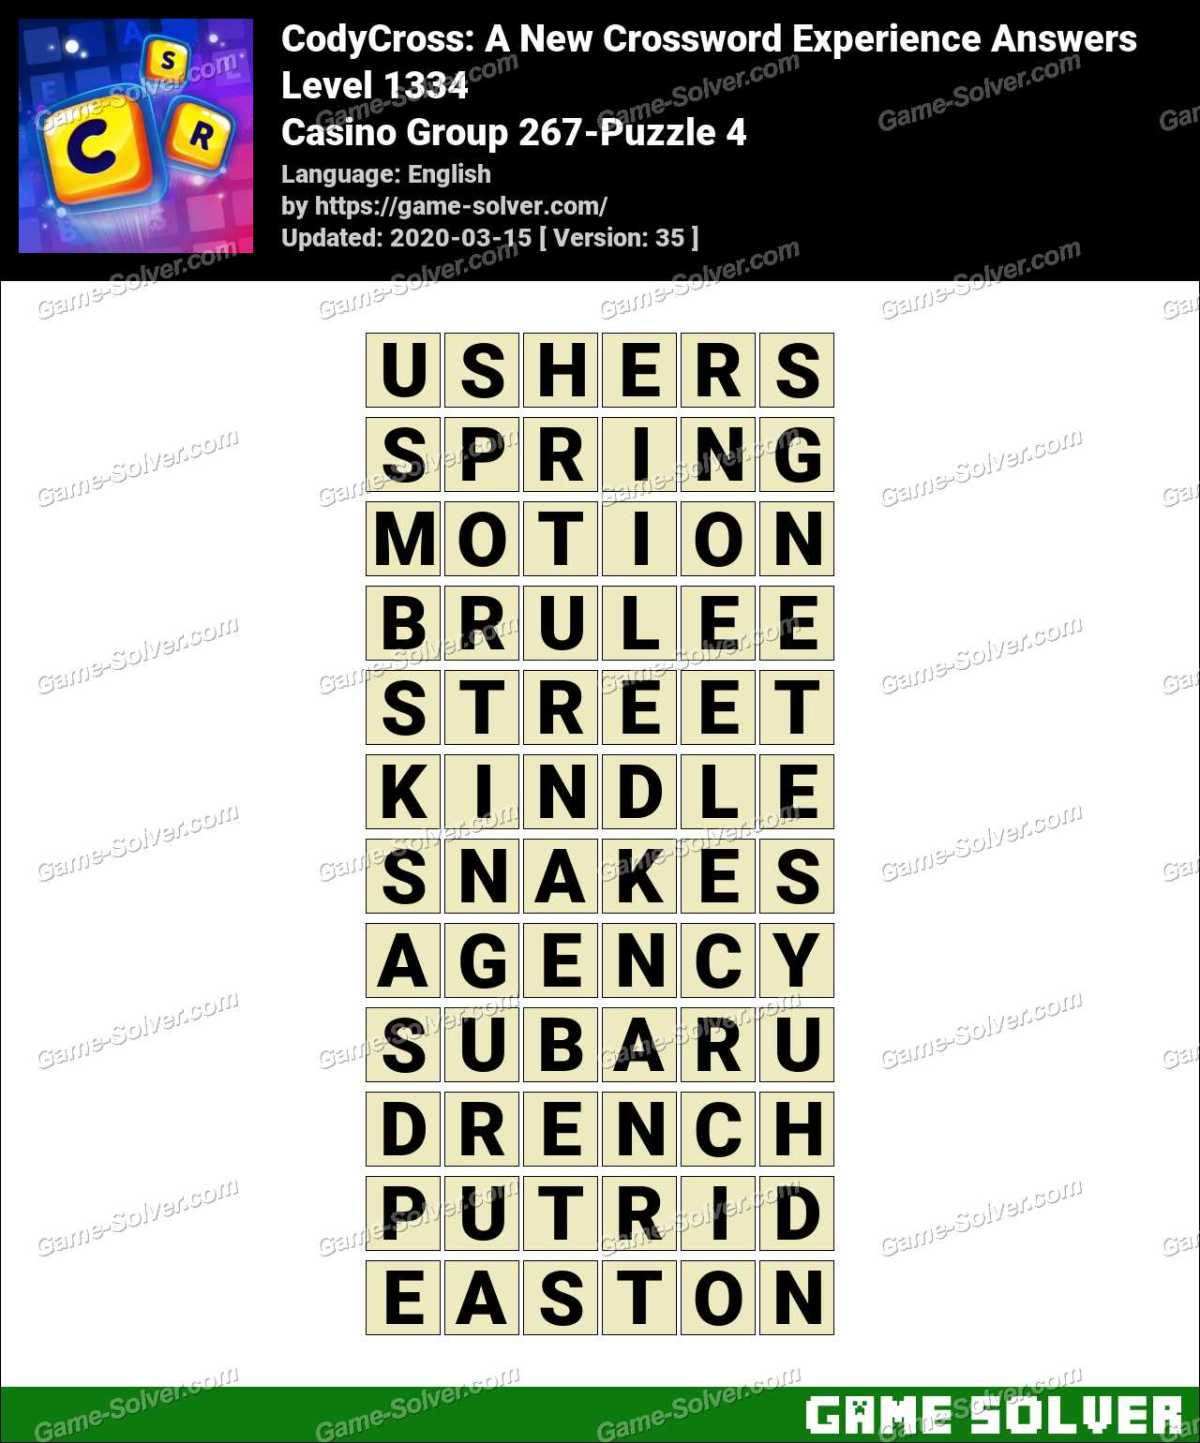 CodyCross Casino Group 267-Puzzle 4 Answers